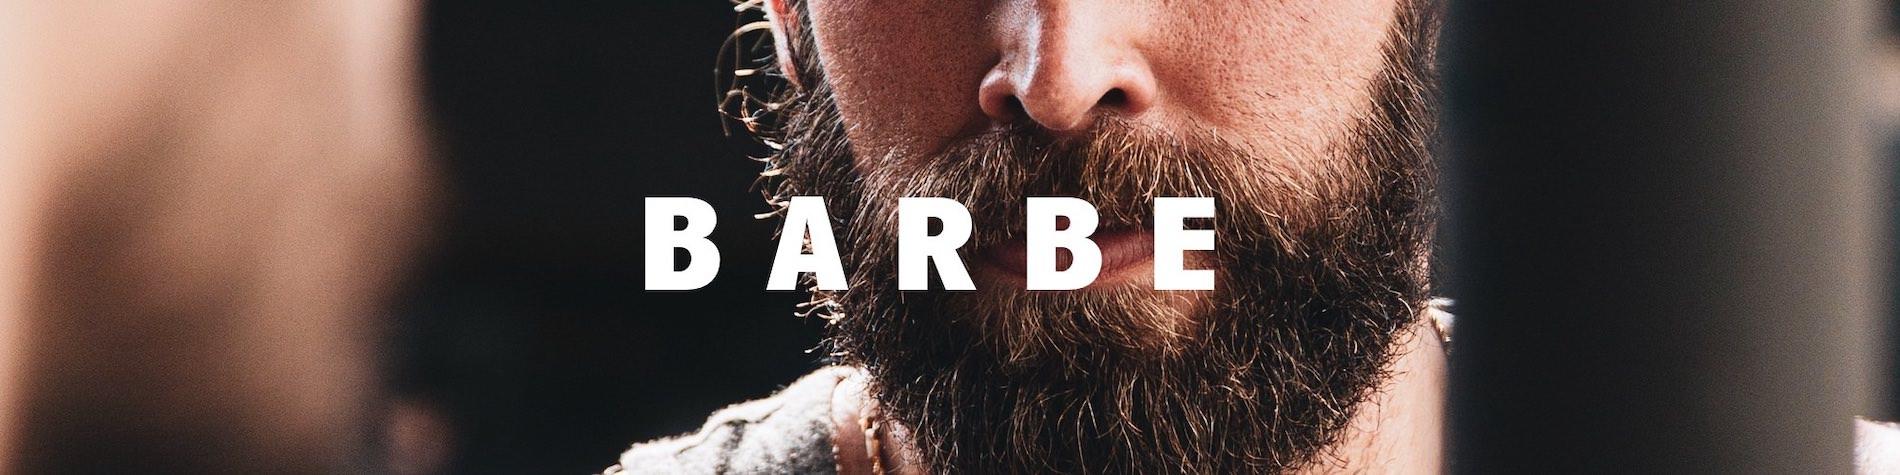 produit barbe homme